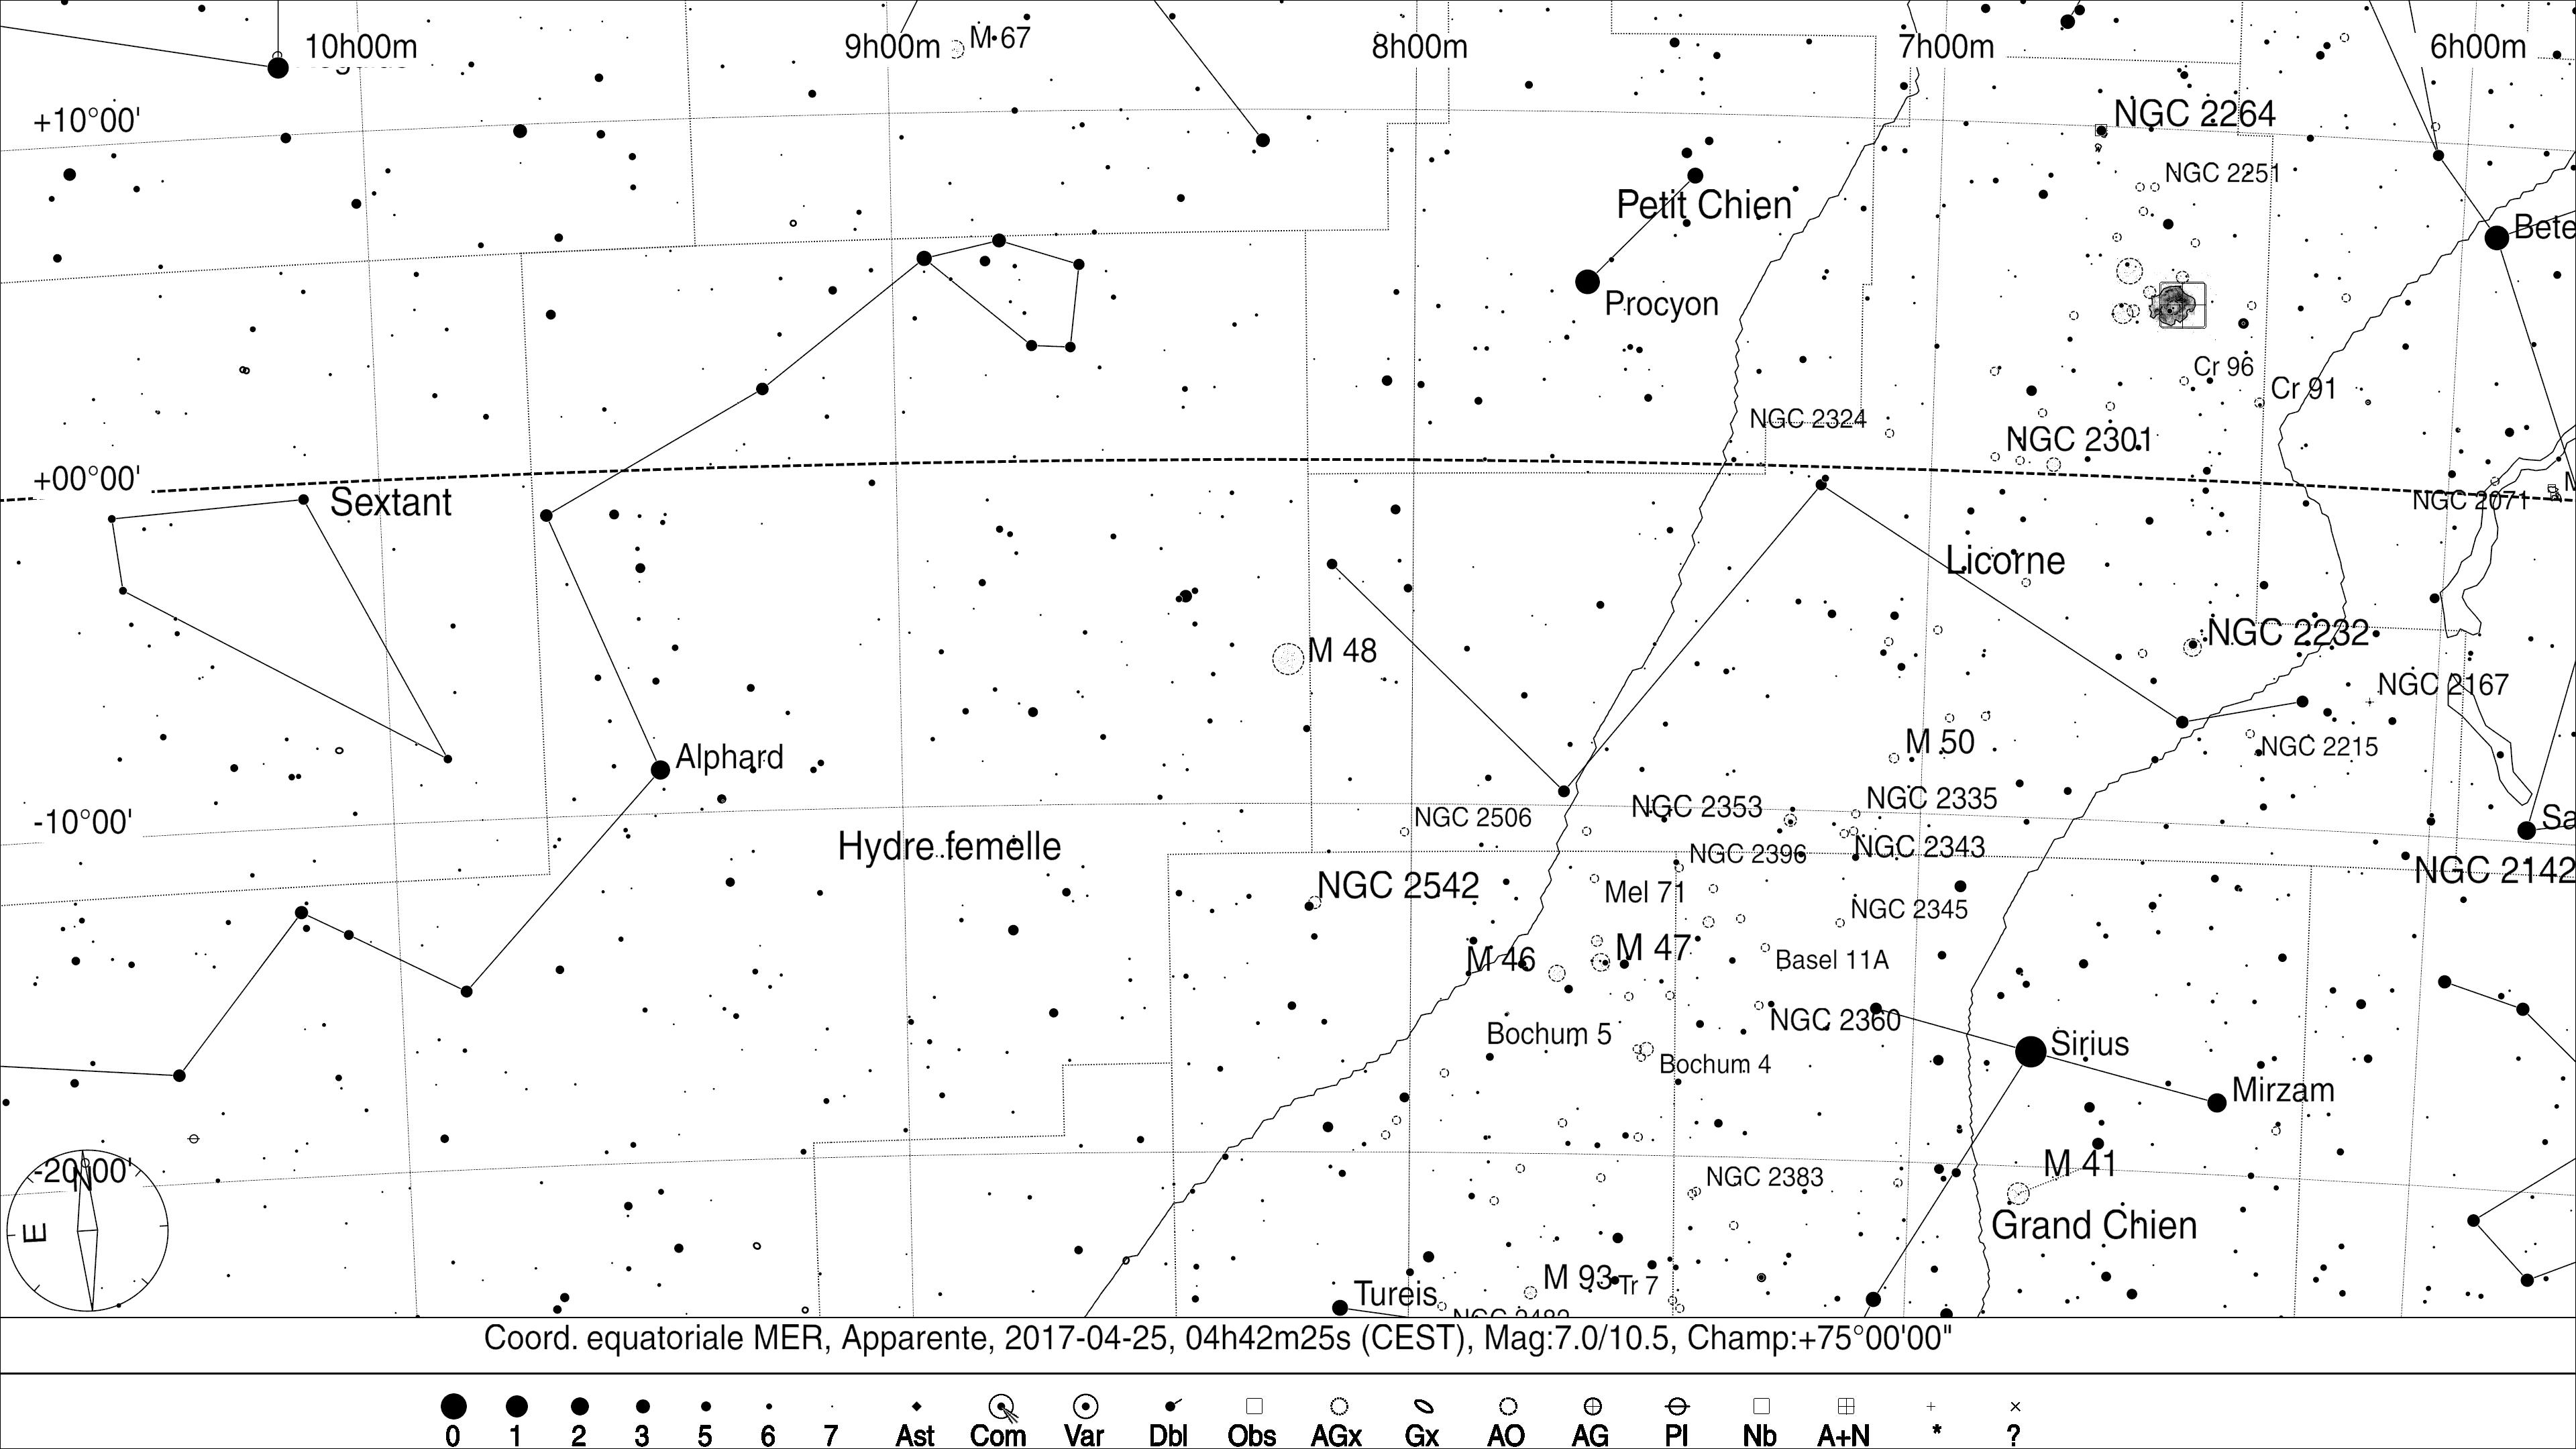 M48_75